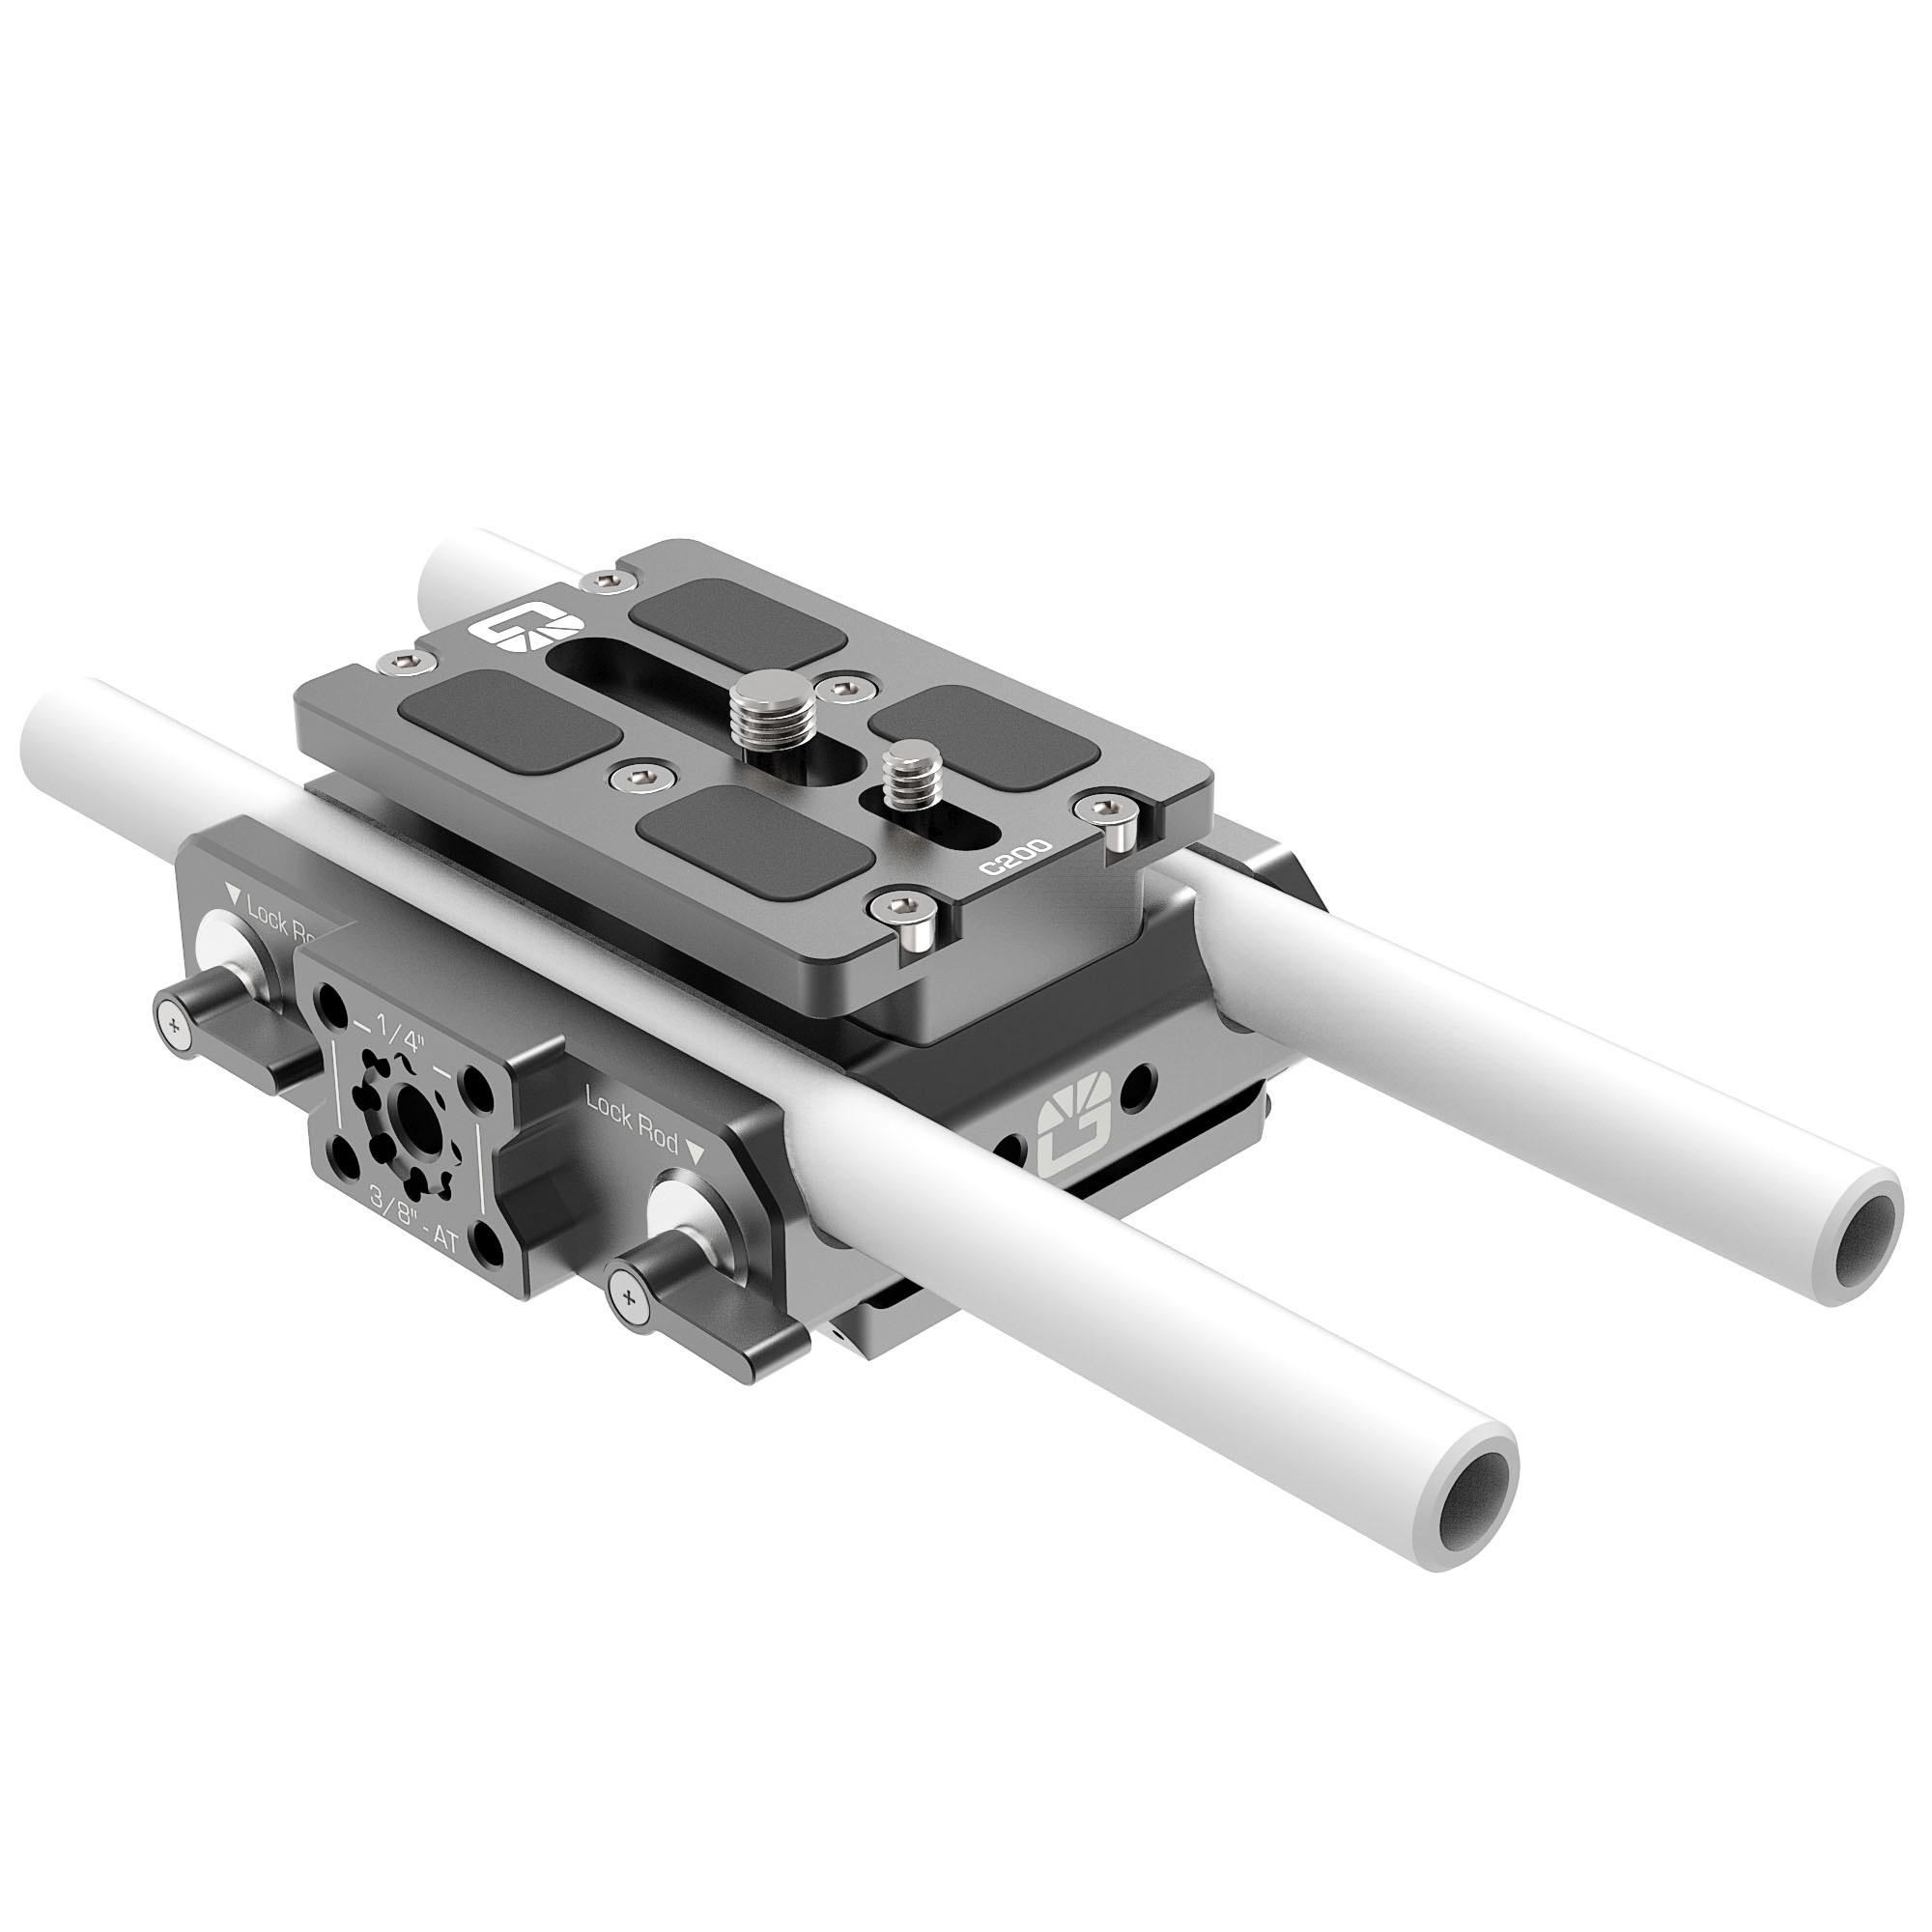 B4005.0001 Canon C200 LWS sliding Baseplate 7